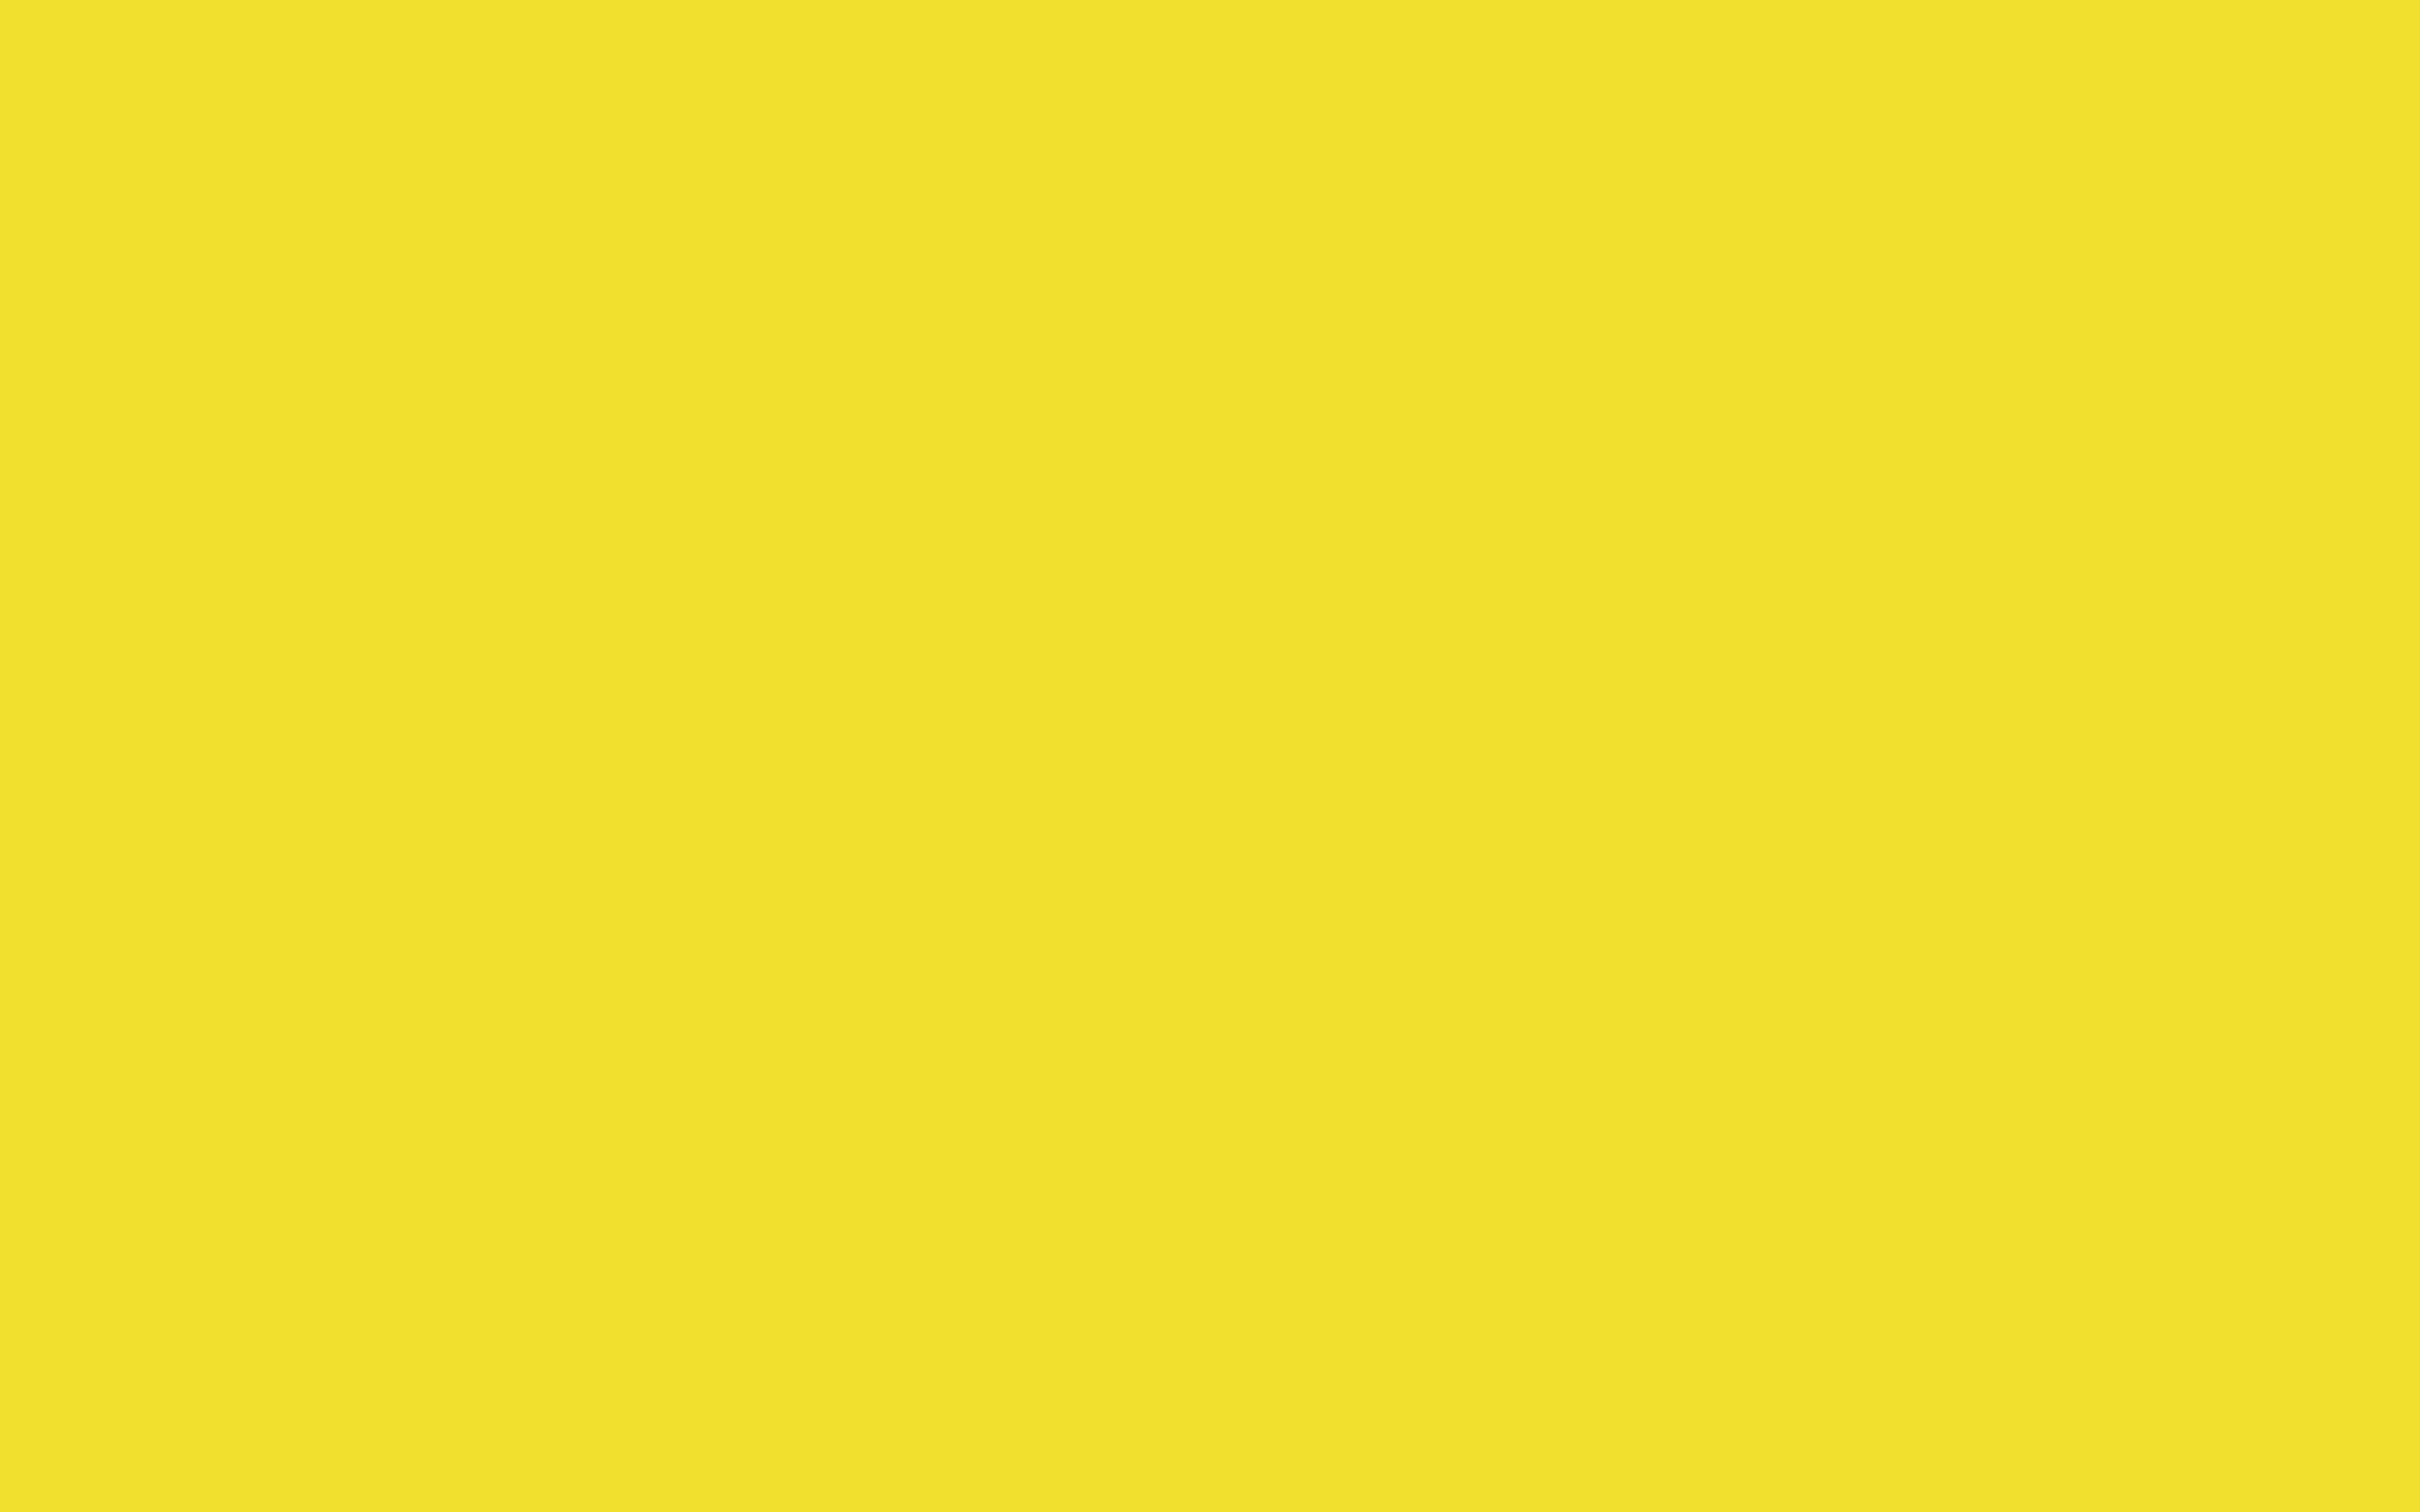 2560x1600 Dandelion Solid Color Background